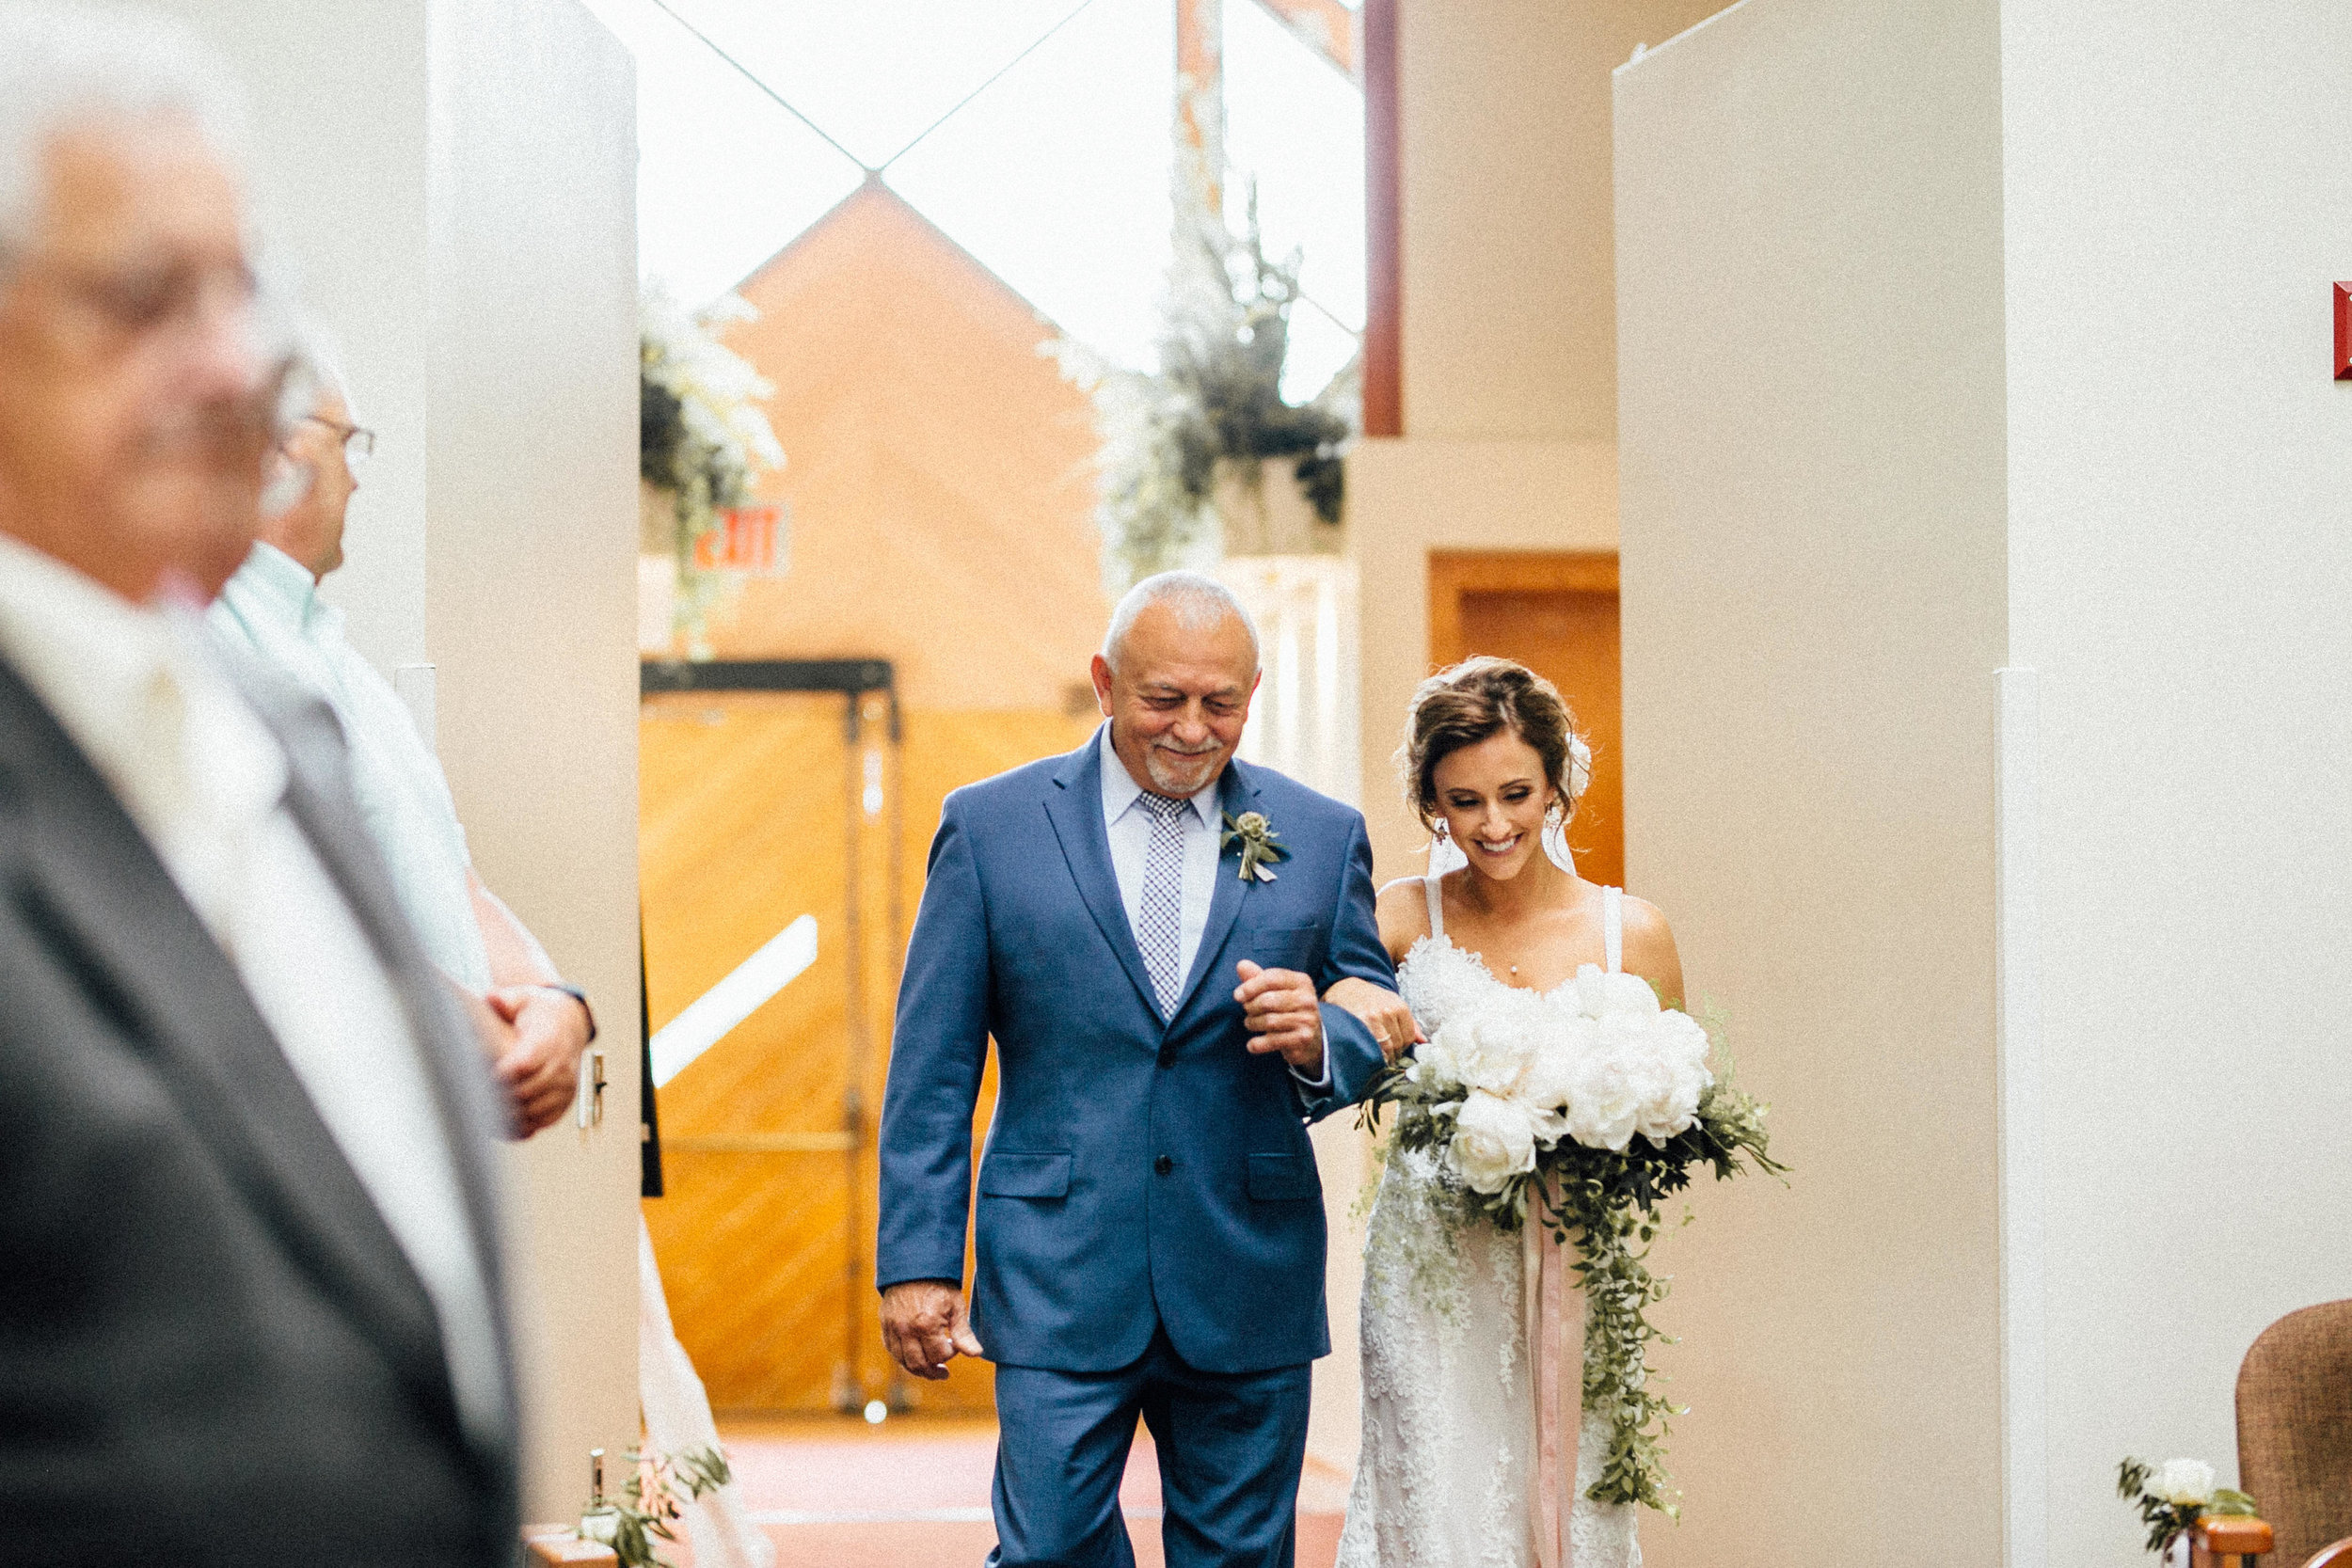 Whitney-Kevin-Ceremony-Michigan-Wedding-Photographer-41.jpg